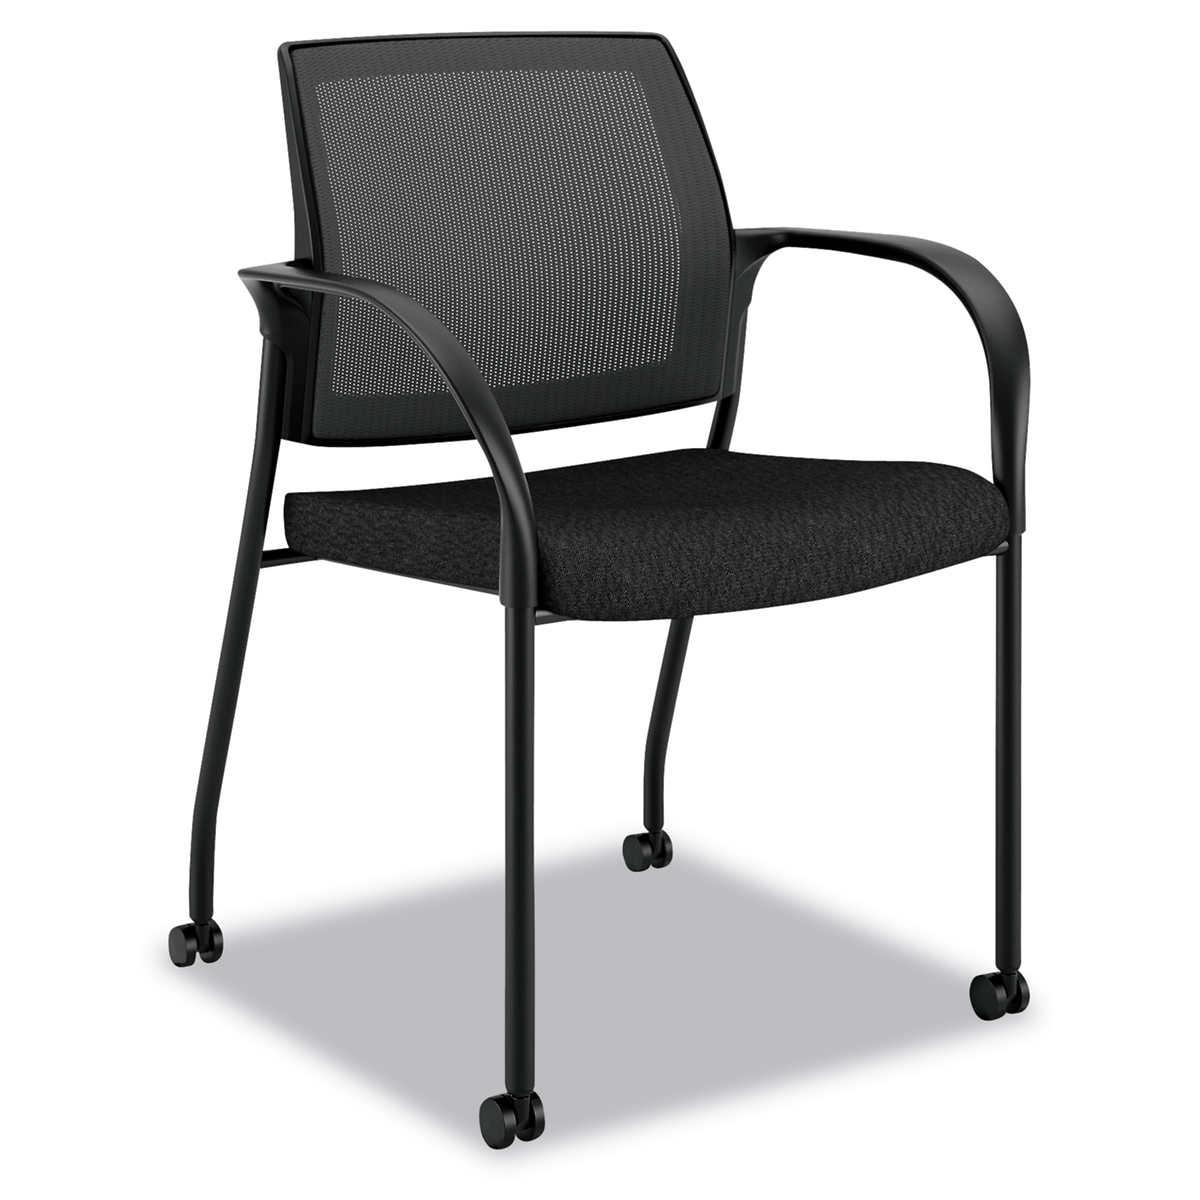 49 costcocom office furniture furniture patio tulsa